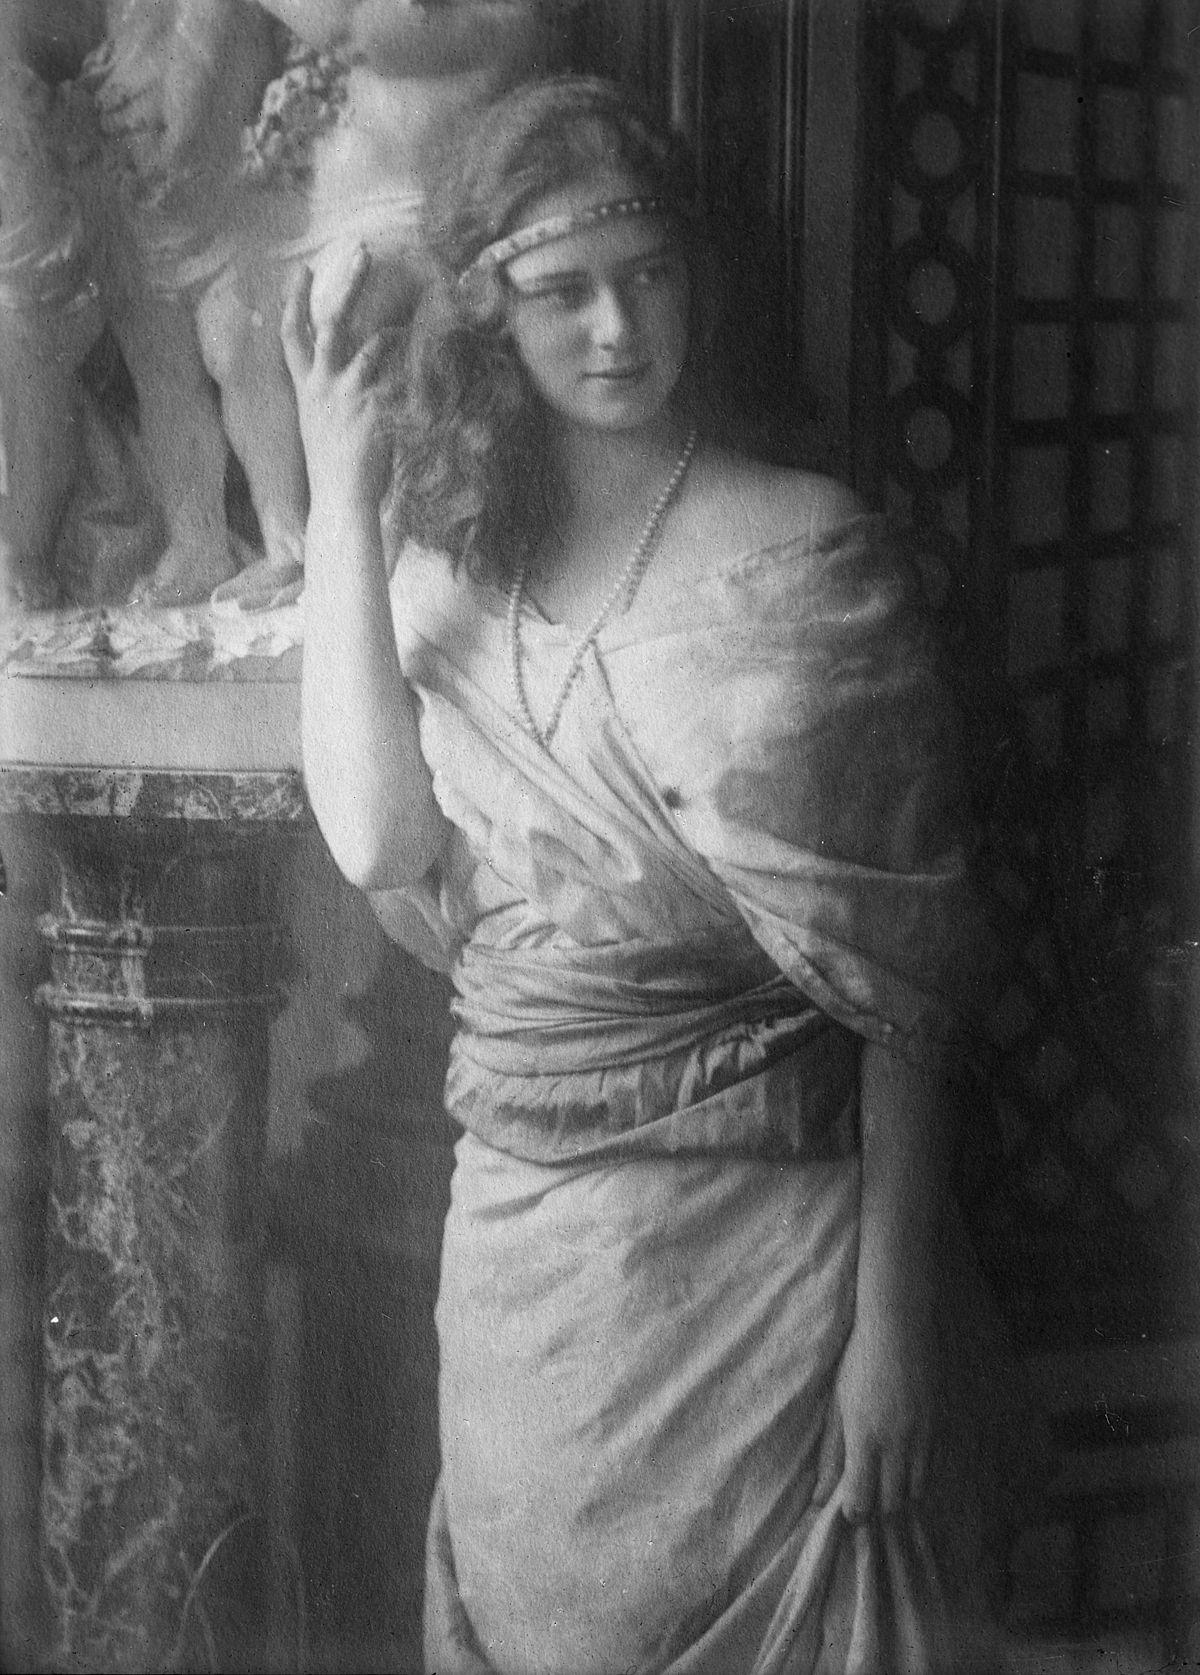 Bronevitskaya Ilona Aleksandrovna: biography, creativity, and interesting facts 65